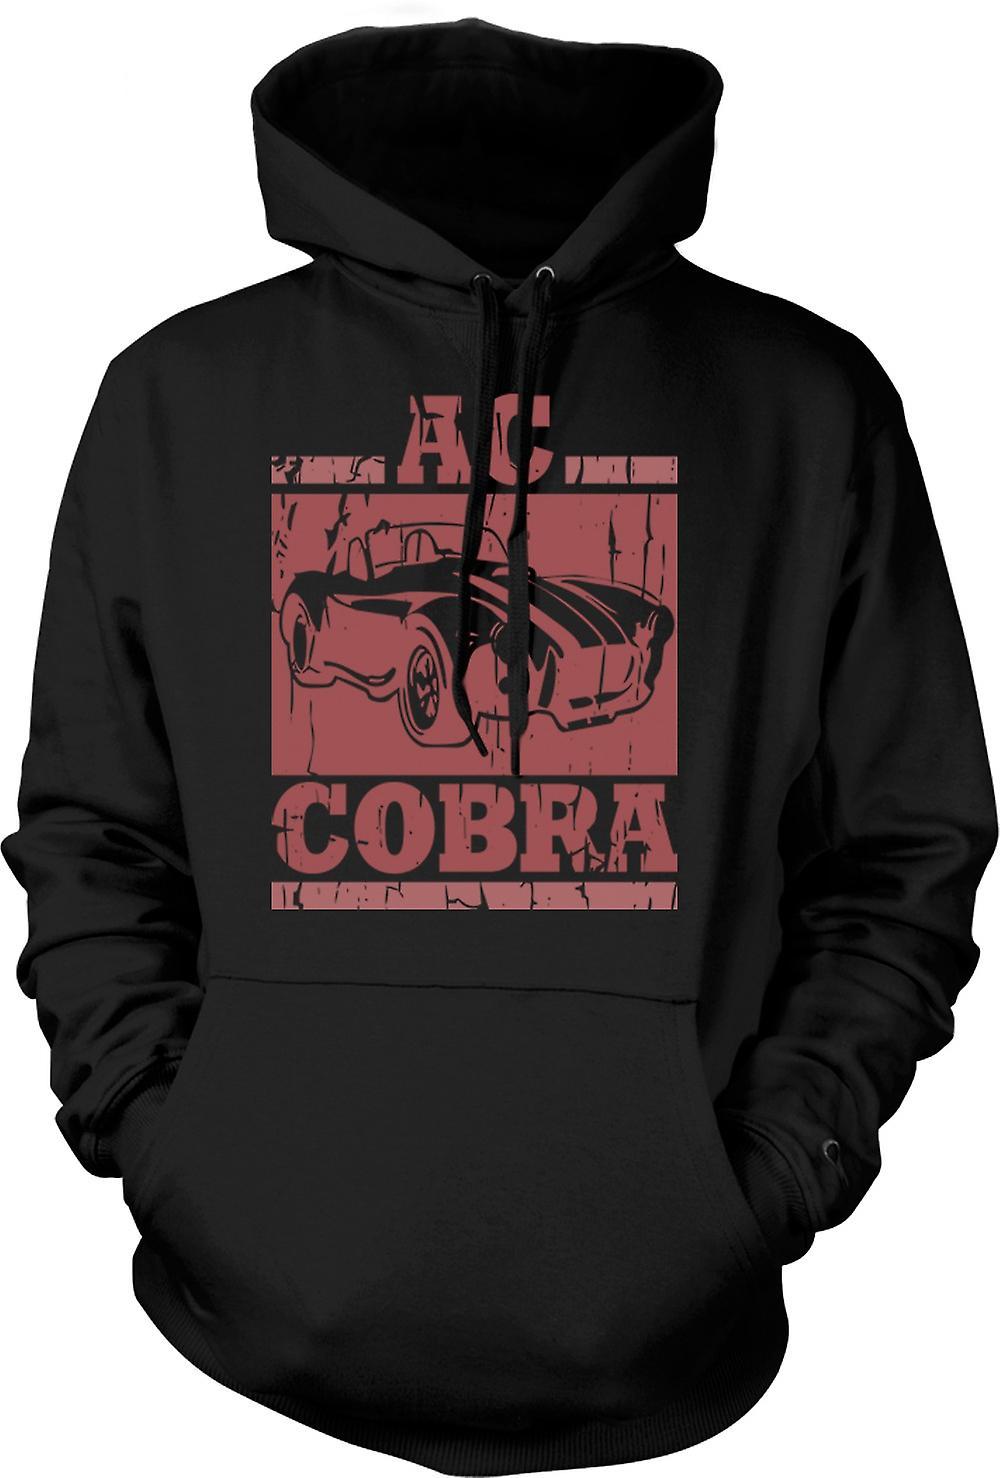 Mens Hoodie - AC Cobra Super Car